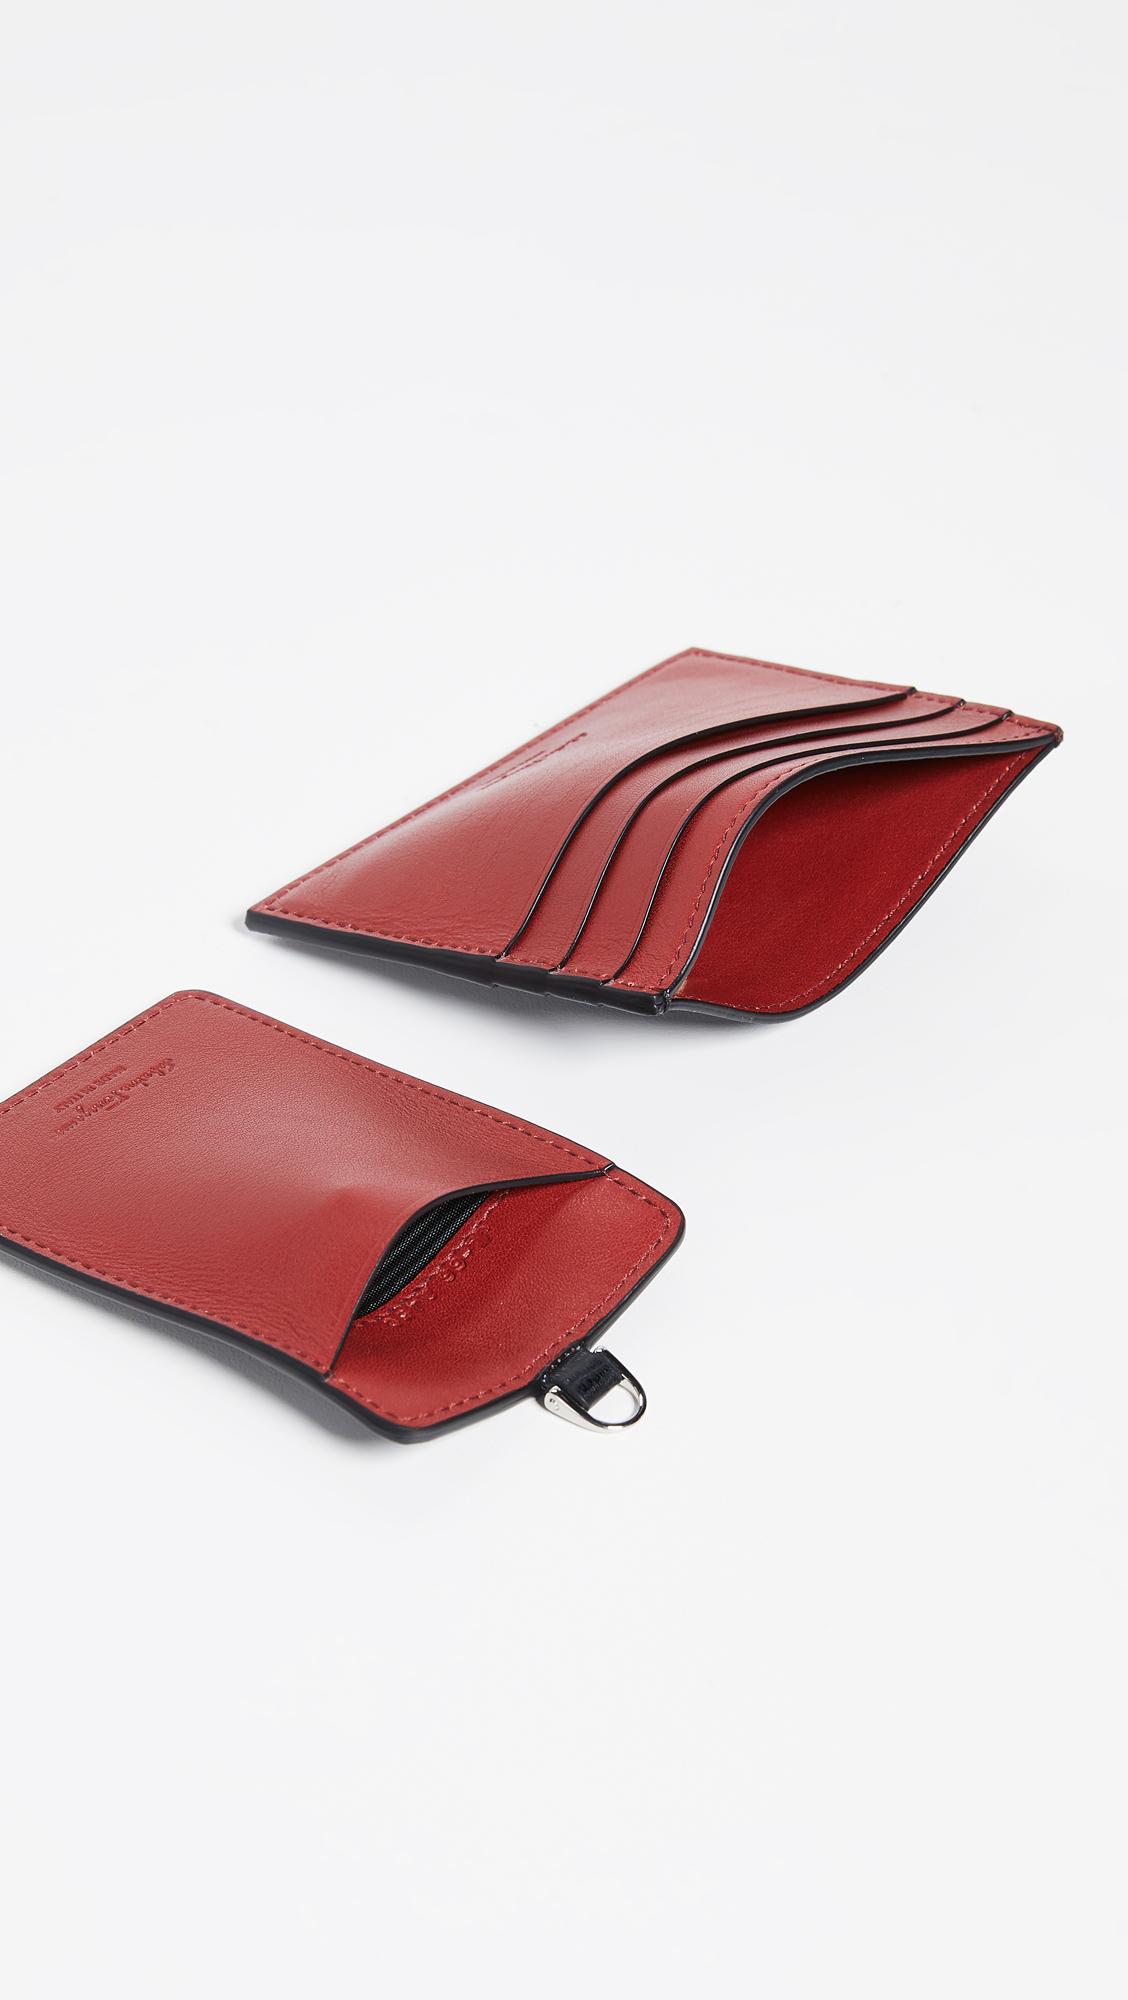 fb1efa03e65 Salvatore Ferragamo Revival Gancini Card Case   Lanyard Gift Box ...